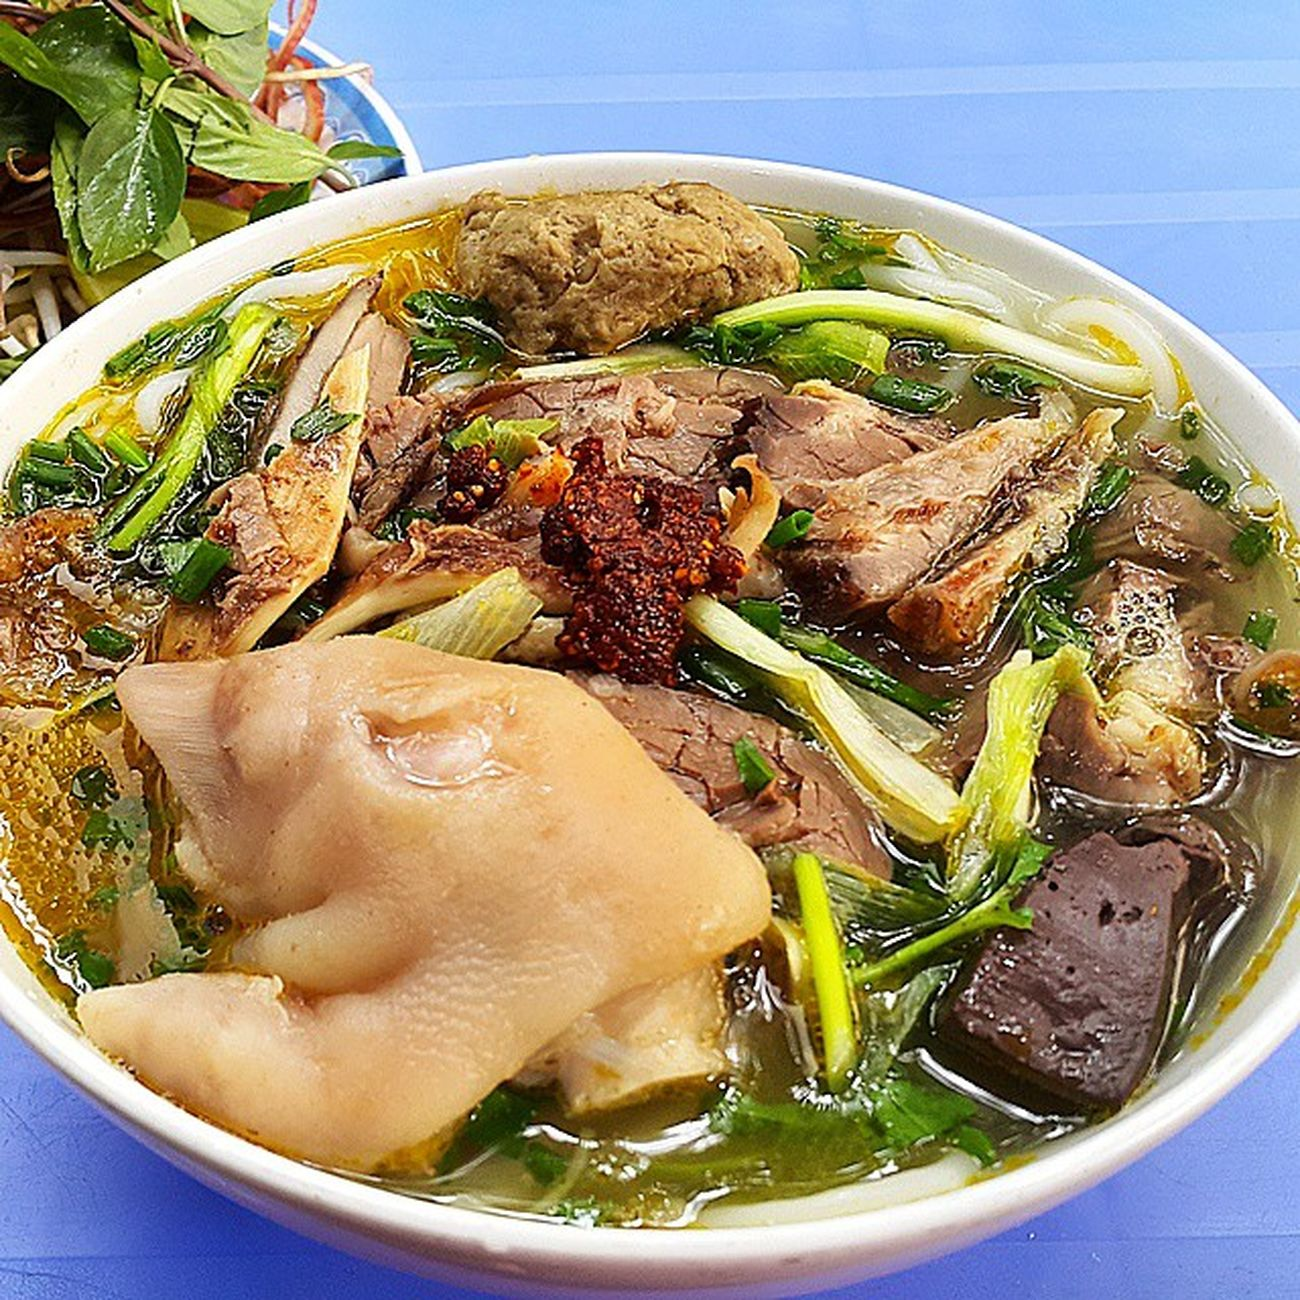 Bún bò Huế. Fuckinawesome Vietnamesefood Vietnam Food Delicious Yummy Beo Noquá